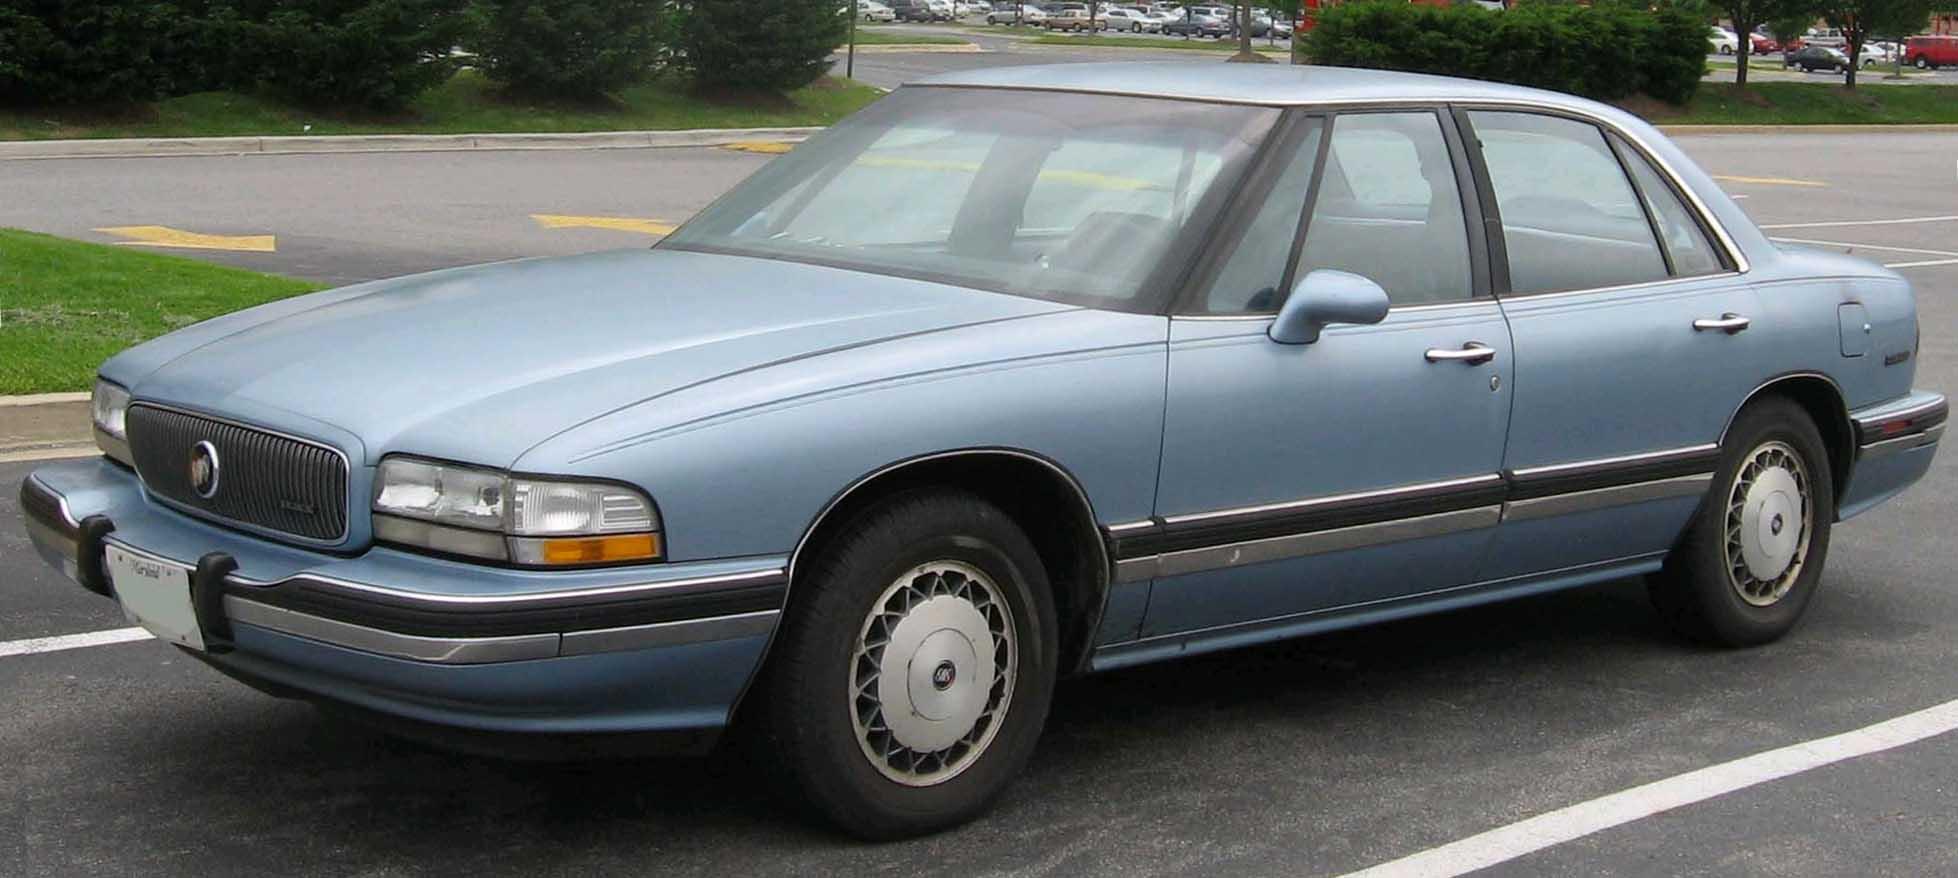 1996 Buick Lesabre >> File 1992 96 Buick Lesabre Jpg Wikimedia Commons